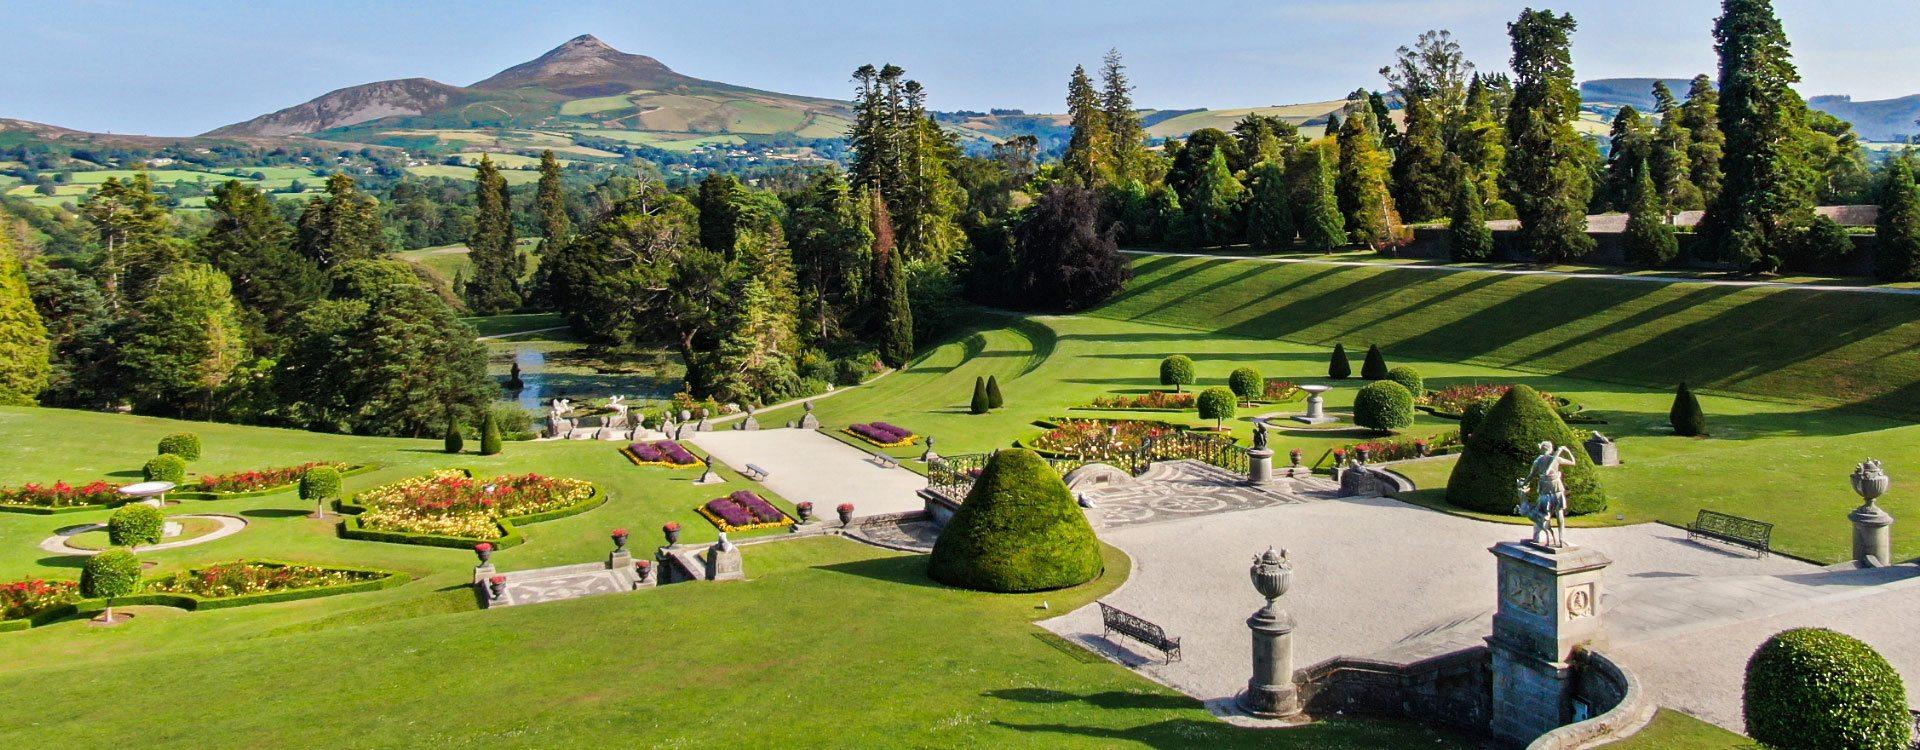 Glendalough & Powerscourt Gardens Tour